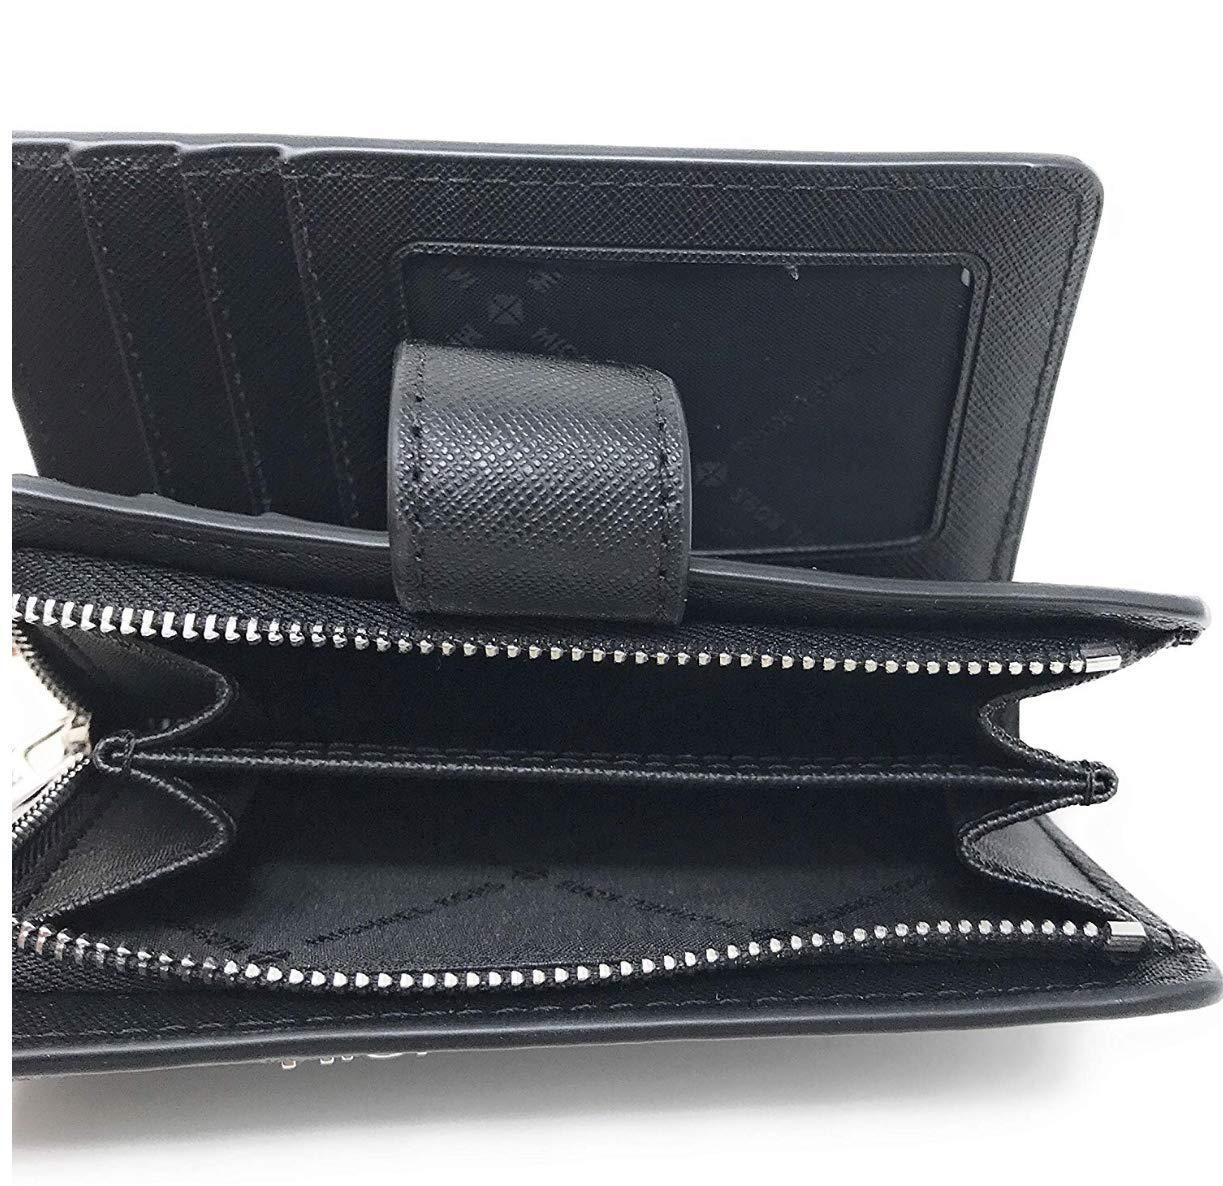 Michael Kors Jet Set Travel Saffiano Leather Bifold Zip Coin Wallet (Black PVC 2019) by Michael Kors (Image #6)